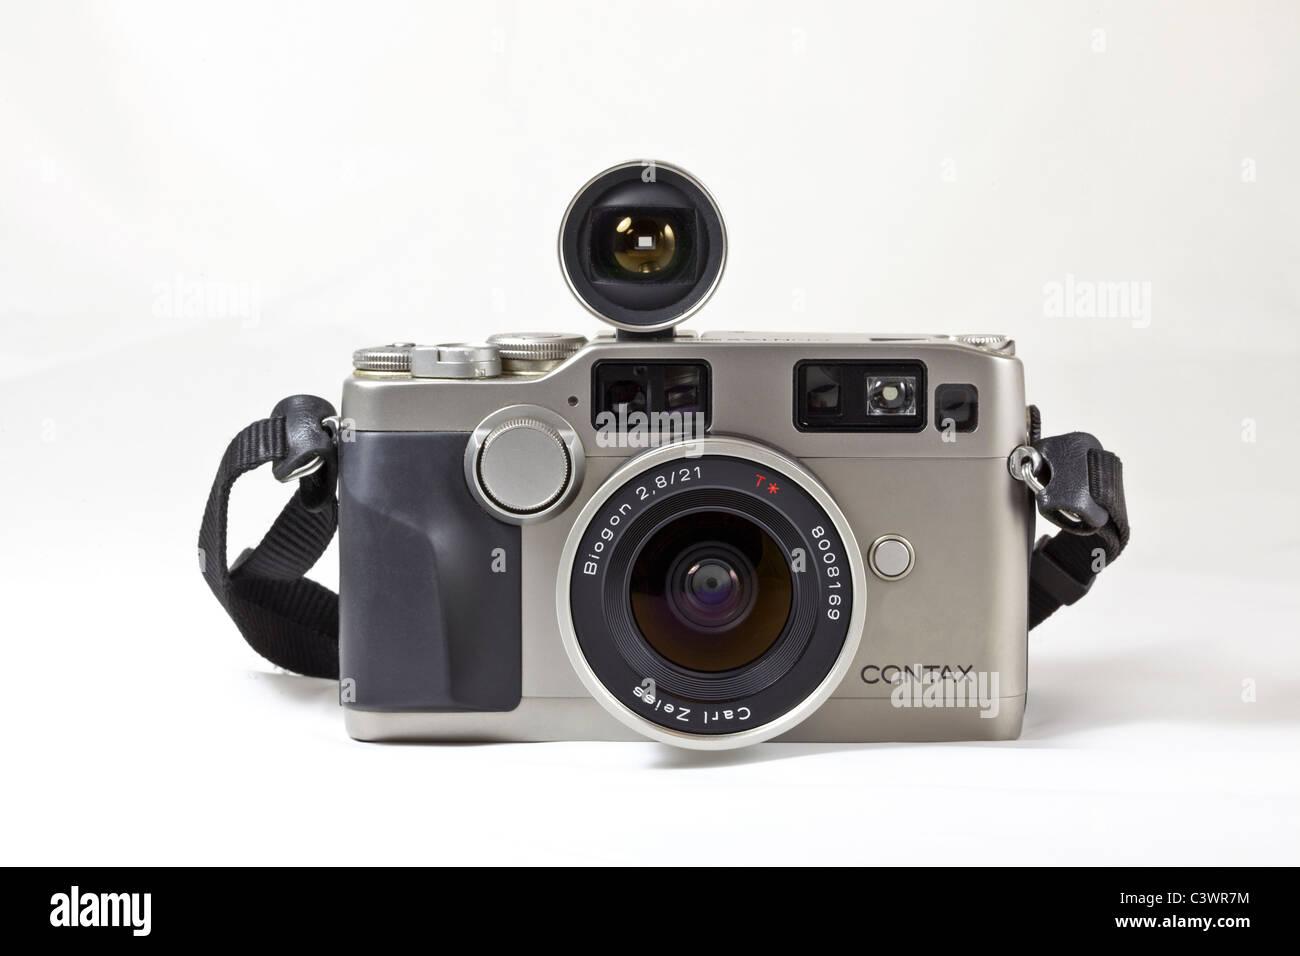 Legendary Contax G2 classic 35mm SLR 'rangefinder type' film camera - Stock Image